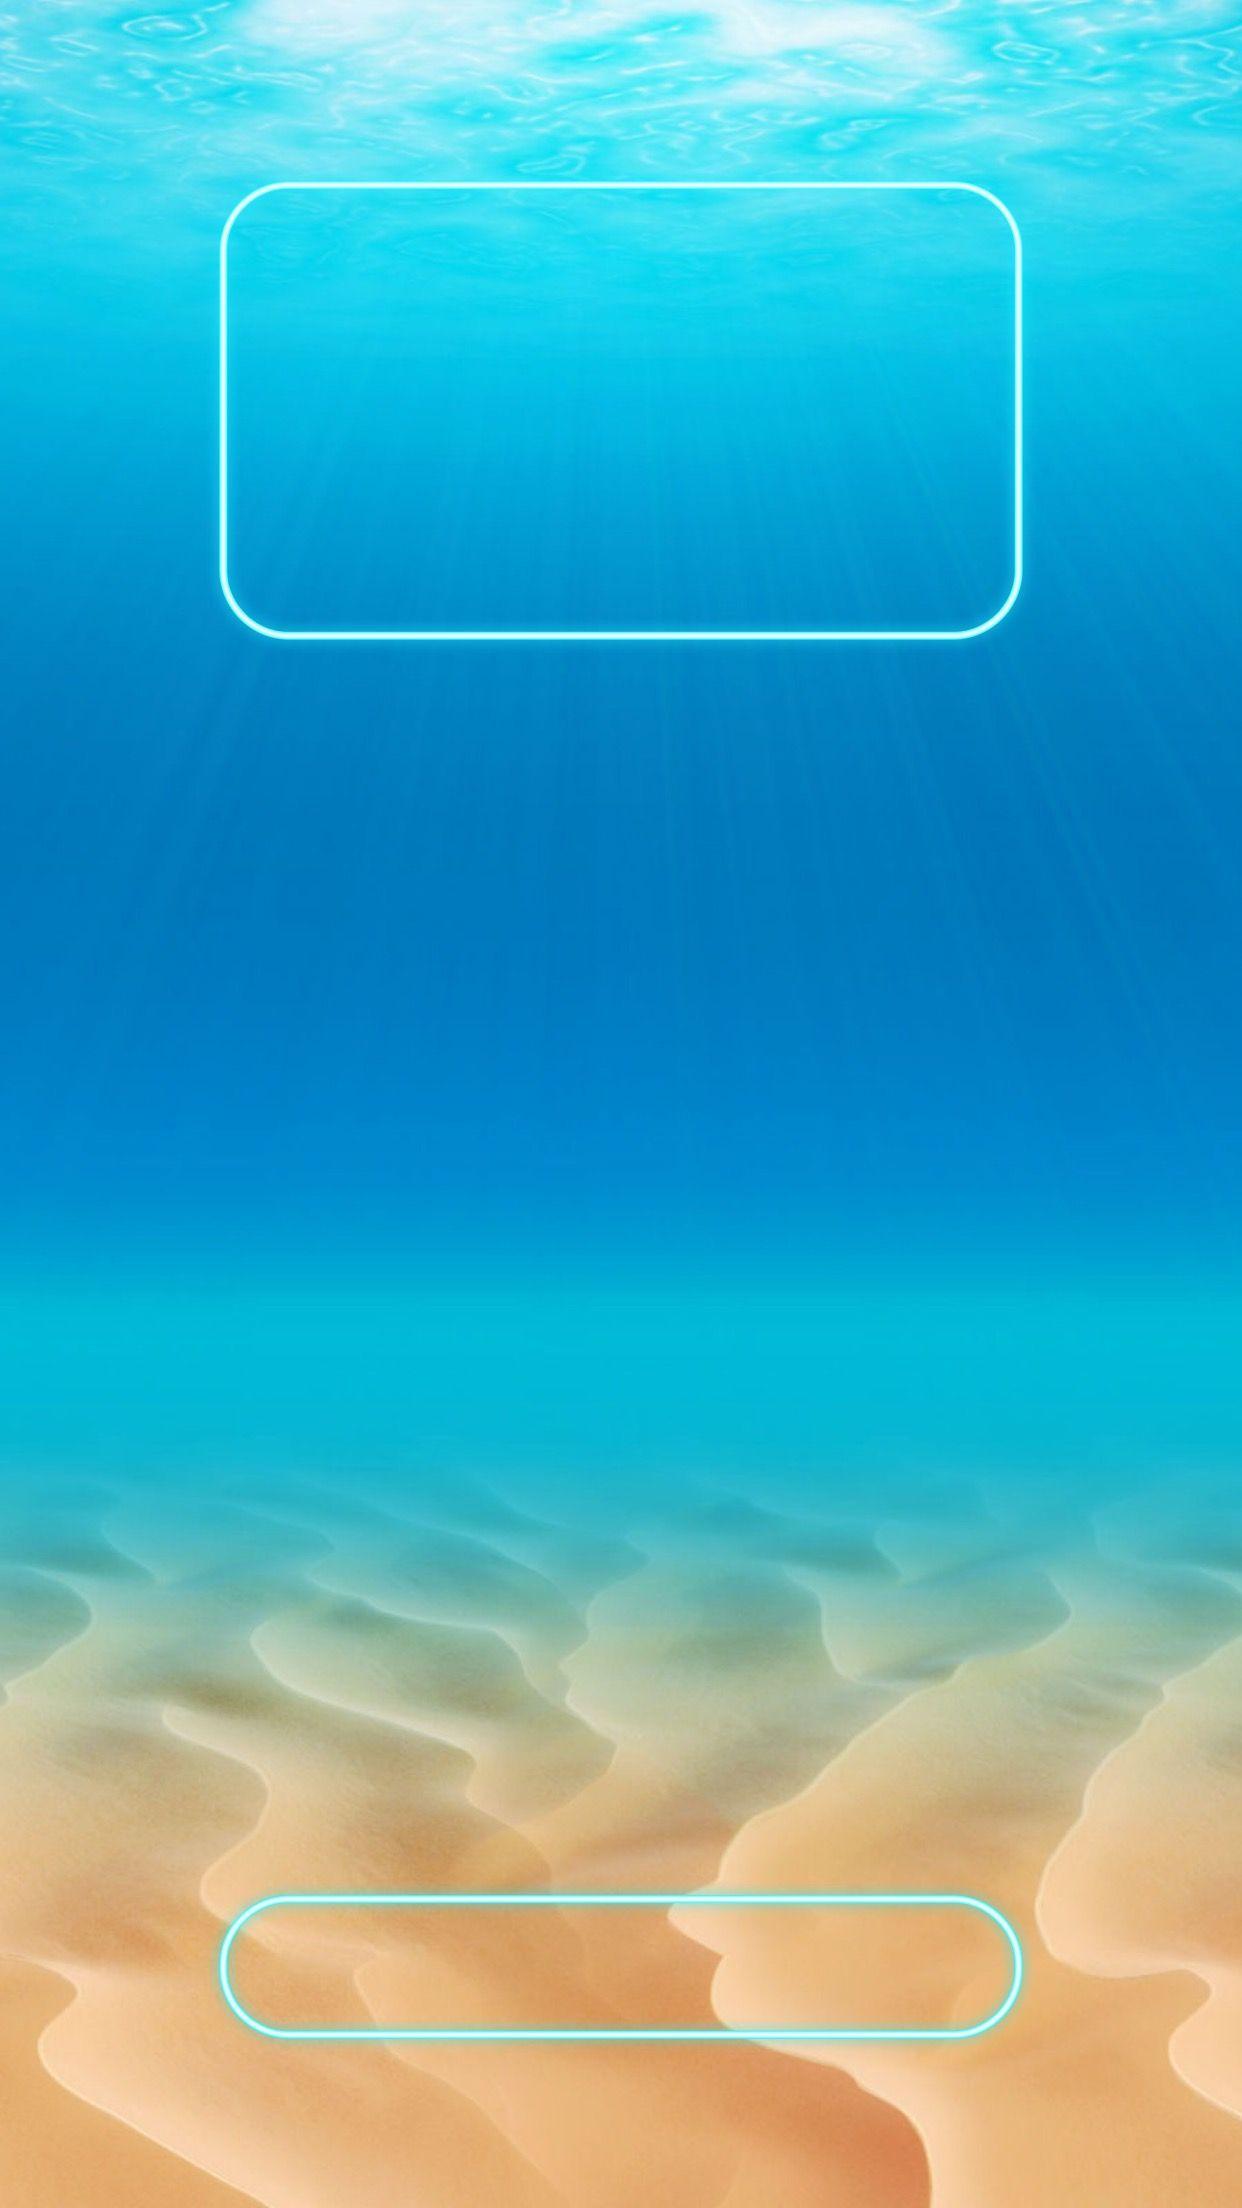 Tap And Get The Free App Lockscreens Art Creative Sand Sea Sun Water Blue Yellow Hd Iphone 6 Plus Lock Screen Iphone Wallpaper Iphone Lockscreen Wallpaper